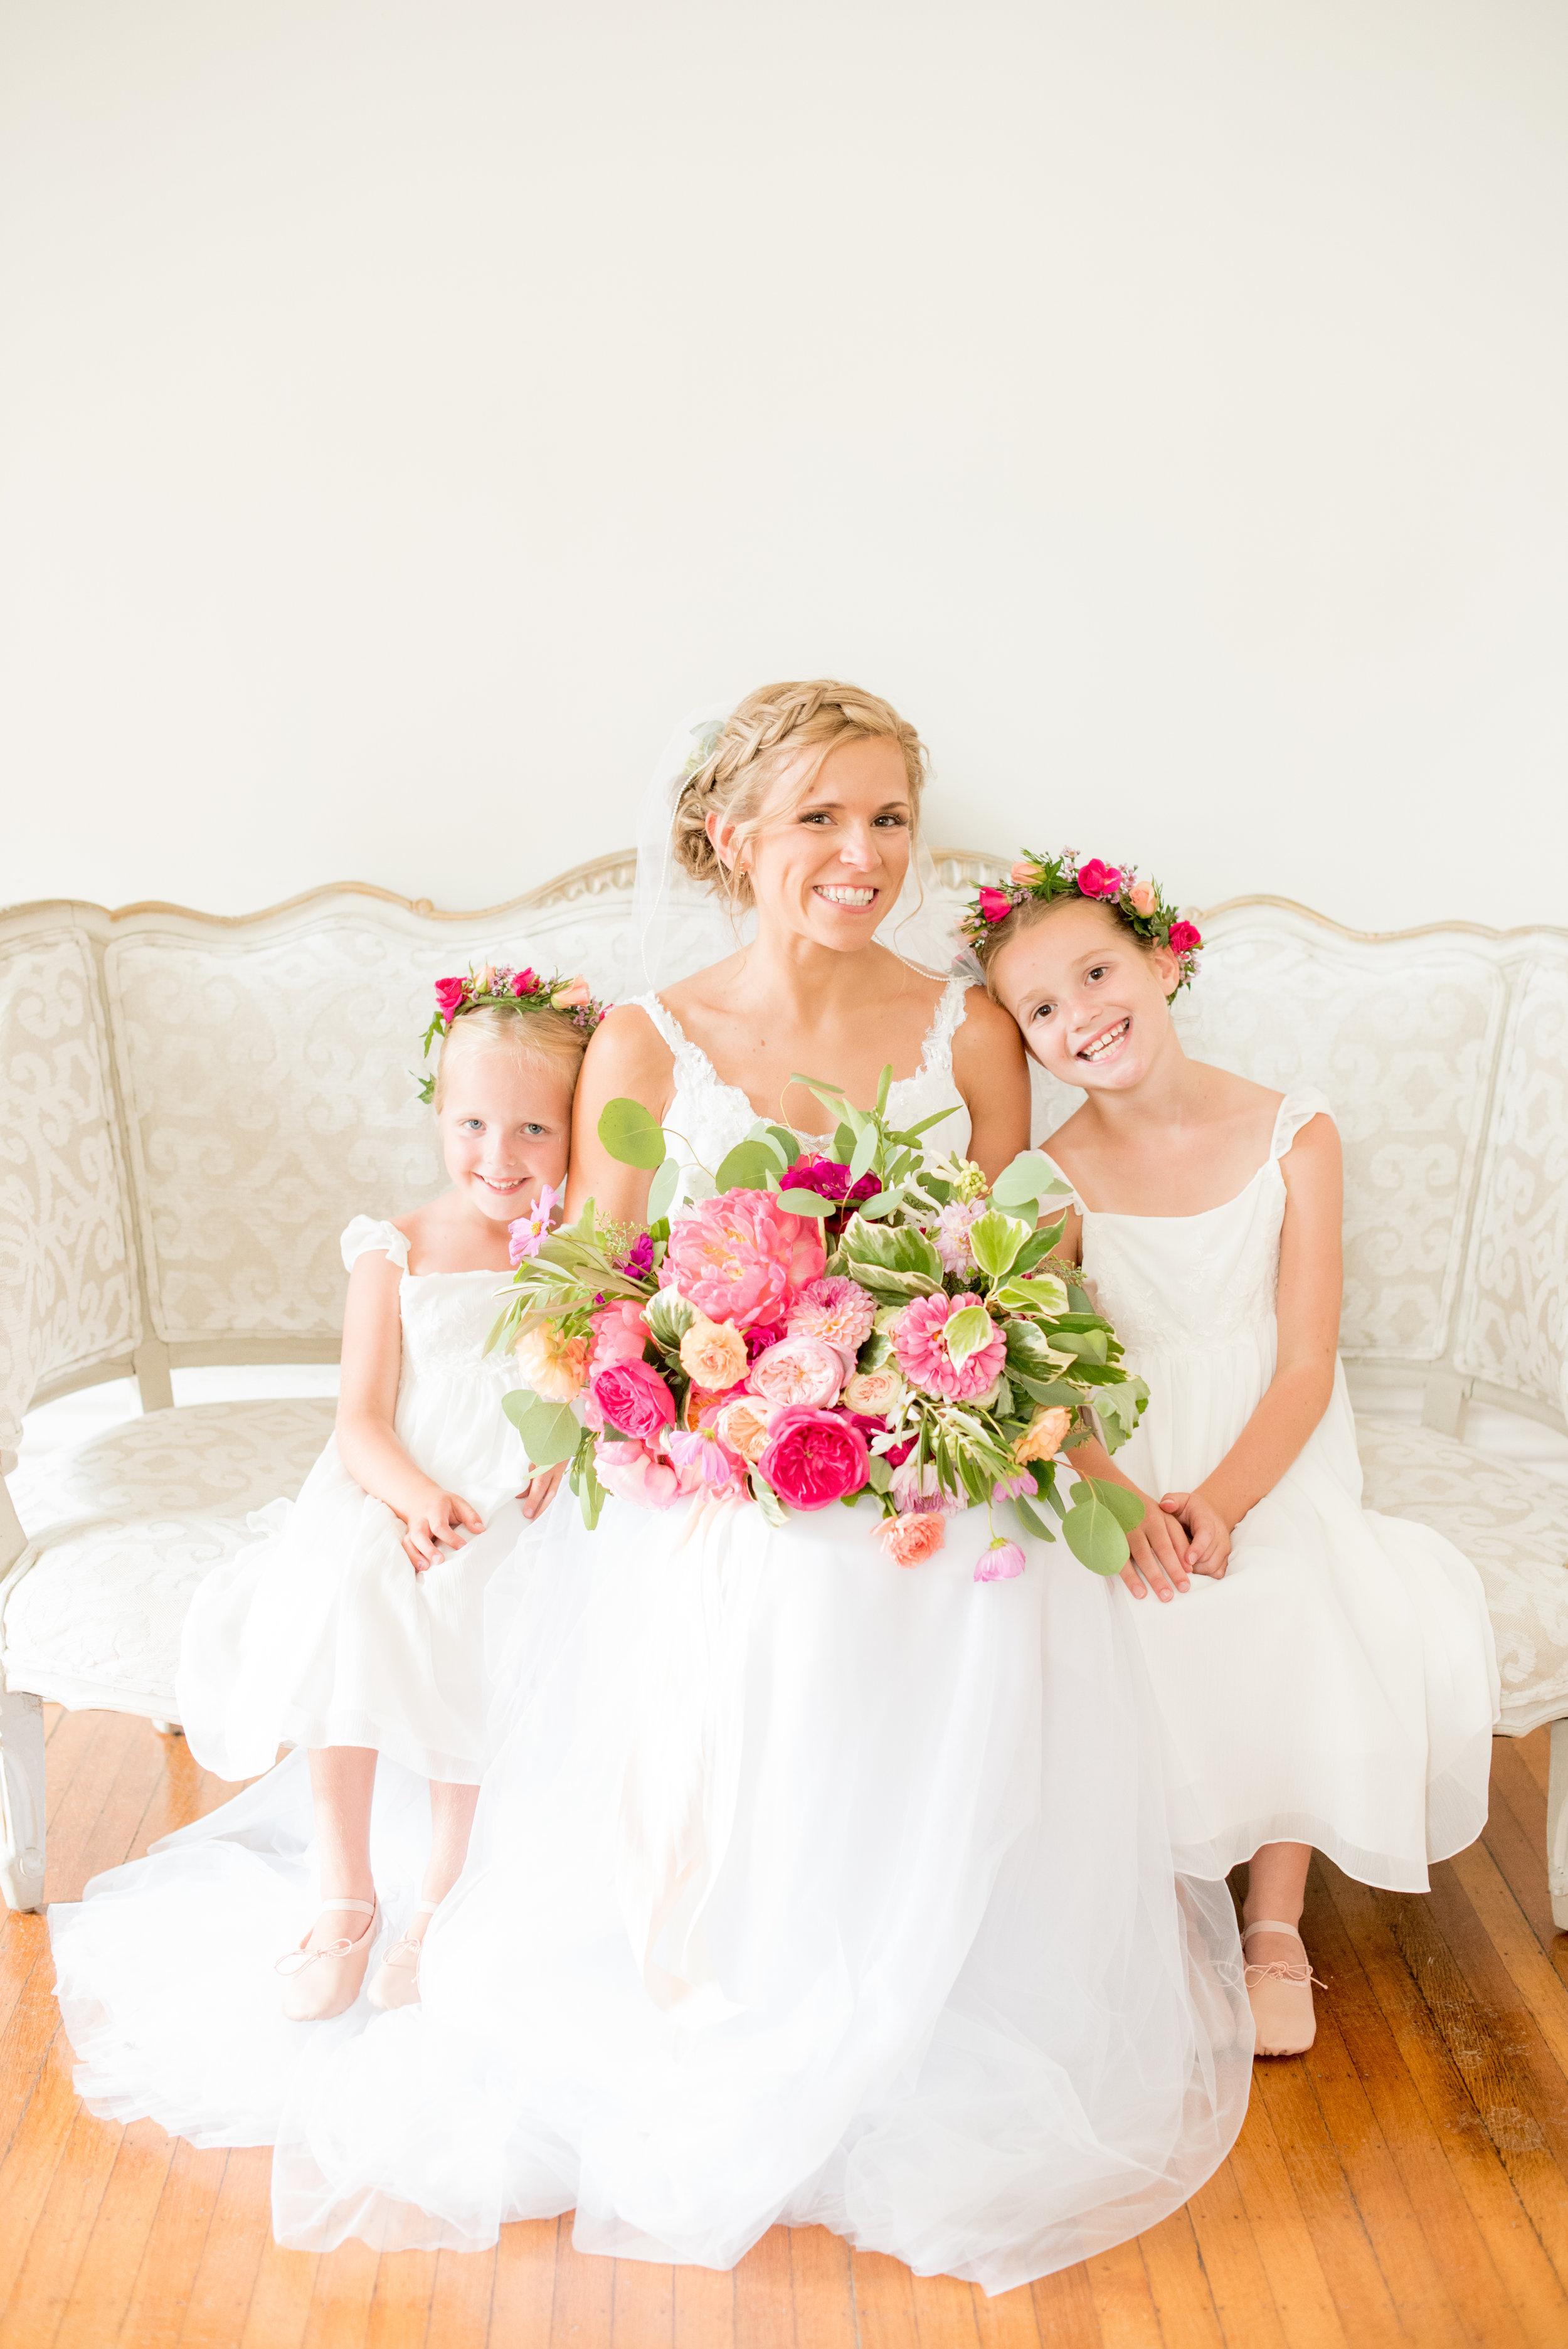 mikkelpaige-nicole_rob-wedding_party-72.jpg